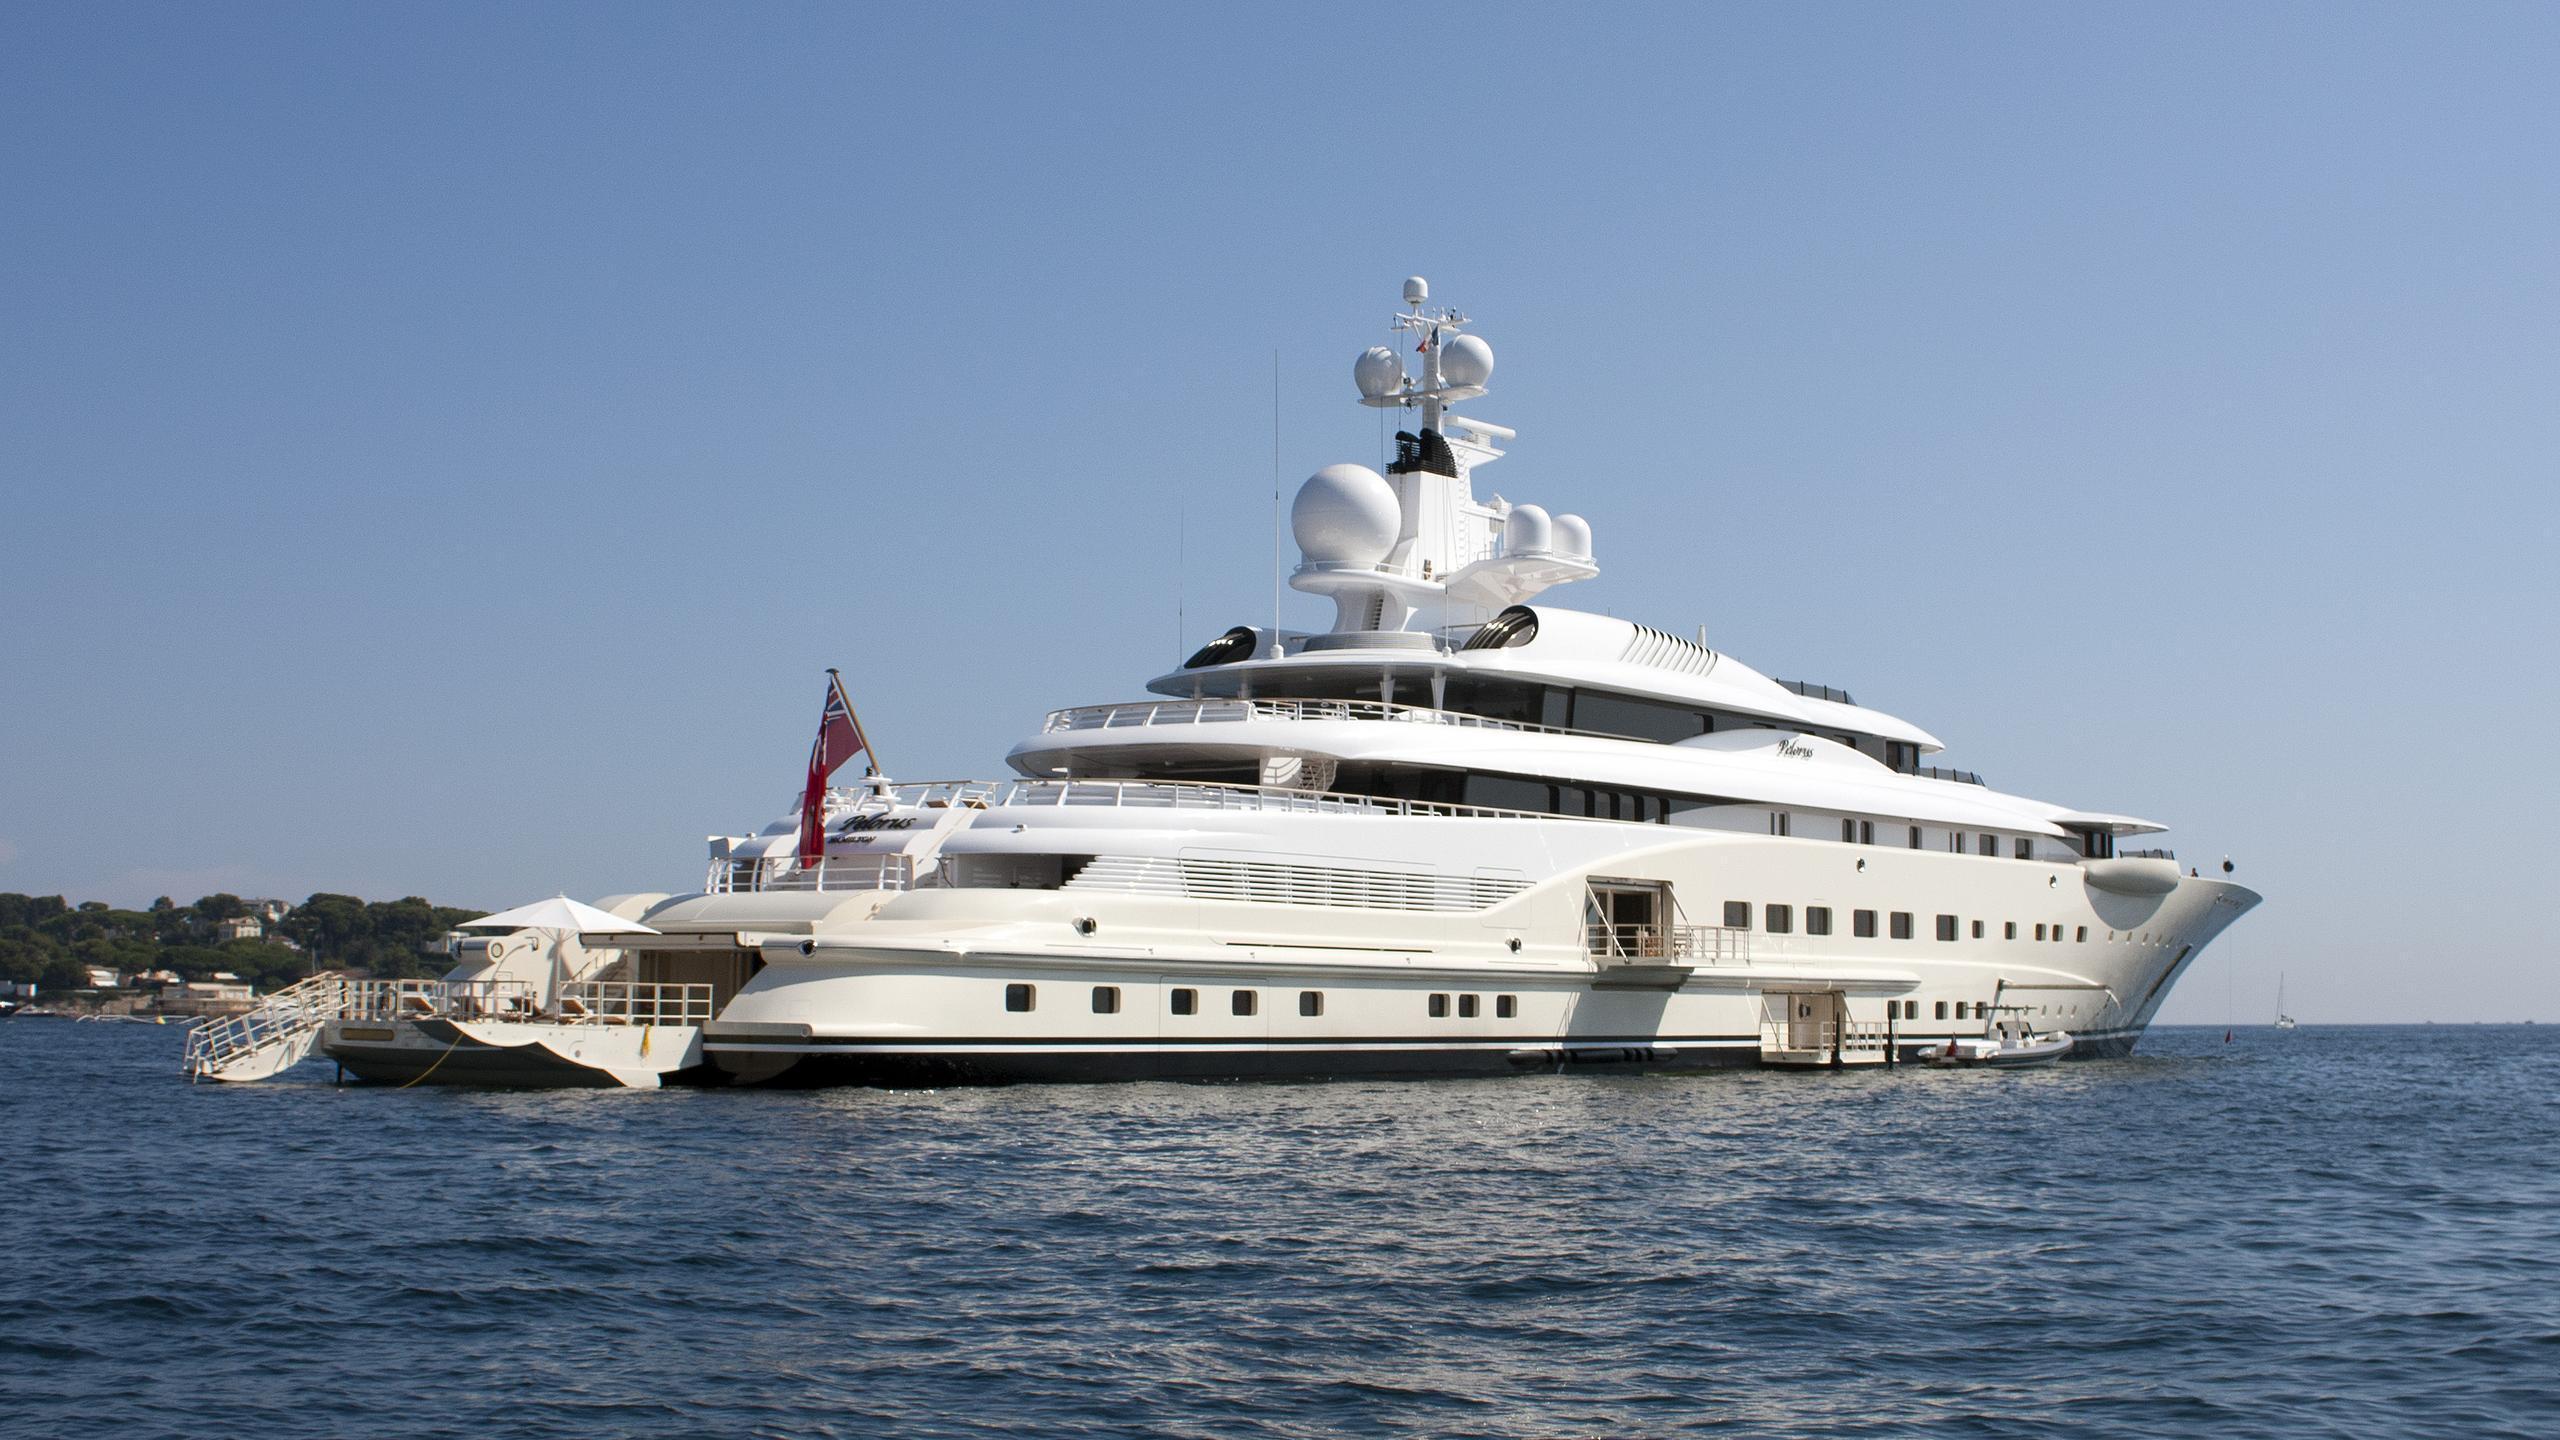 pelorus-motor-yacht-lurssen-2003-114m-back